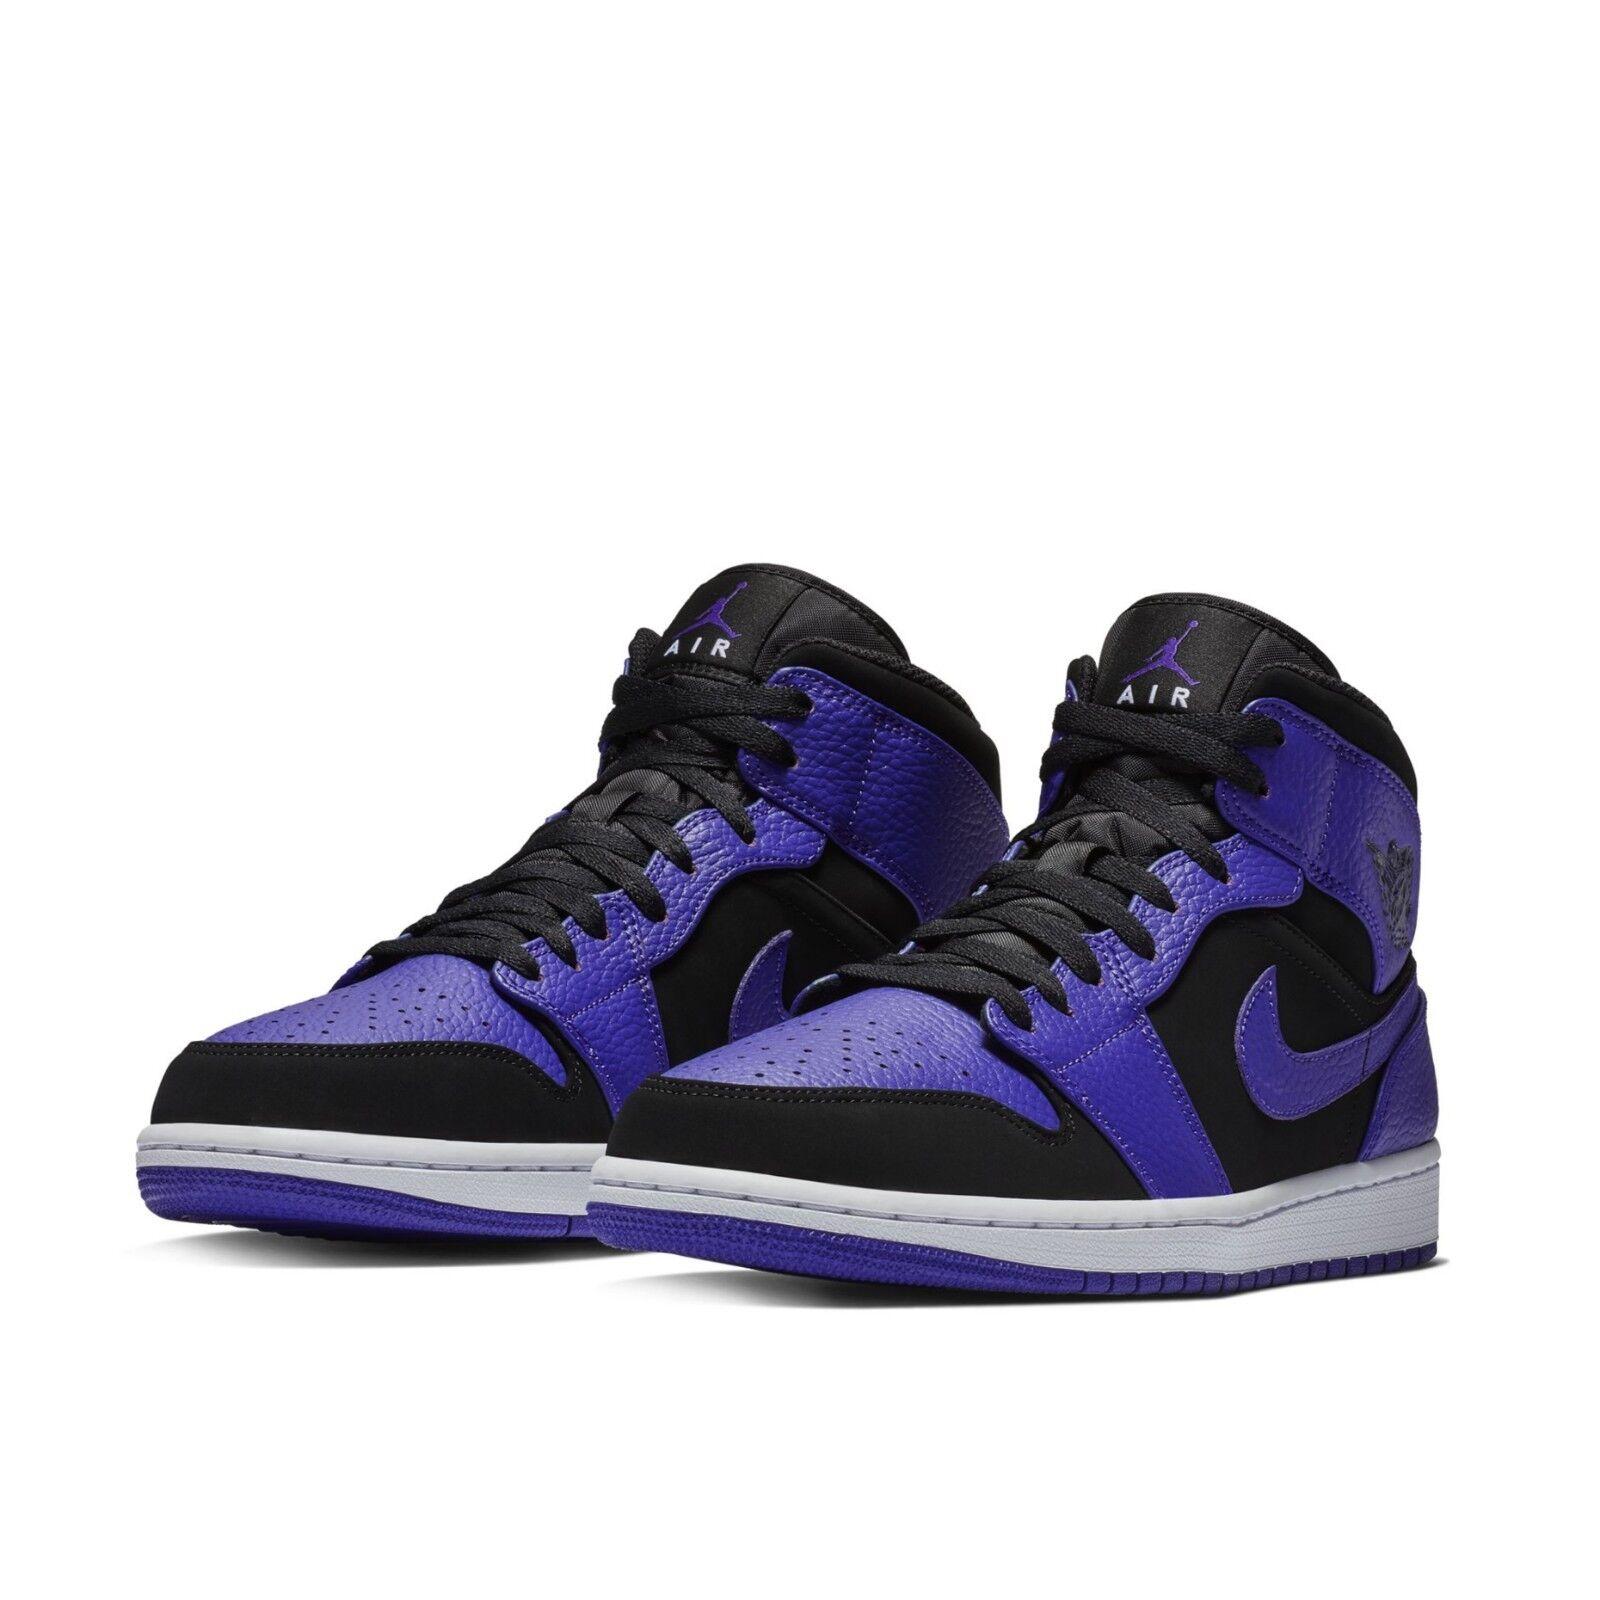 Nike Mens Air Jordan 1 Mid Black Concord Purple shoes Sneakers AJ1 554724-051